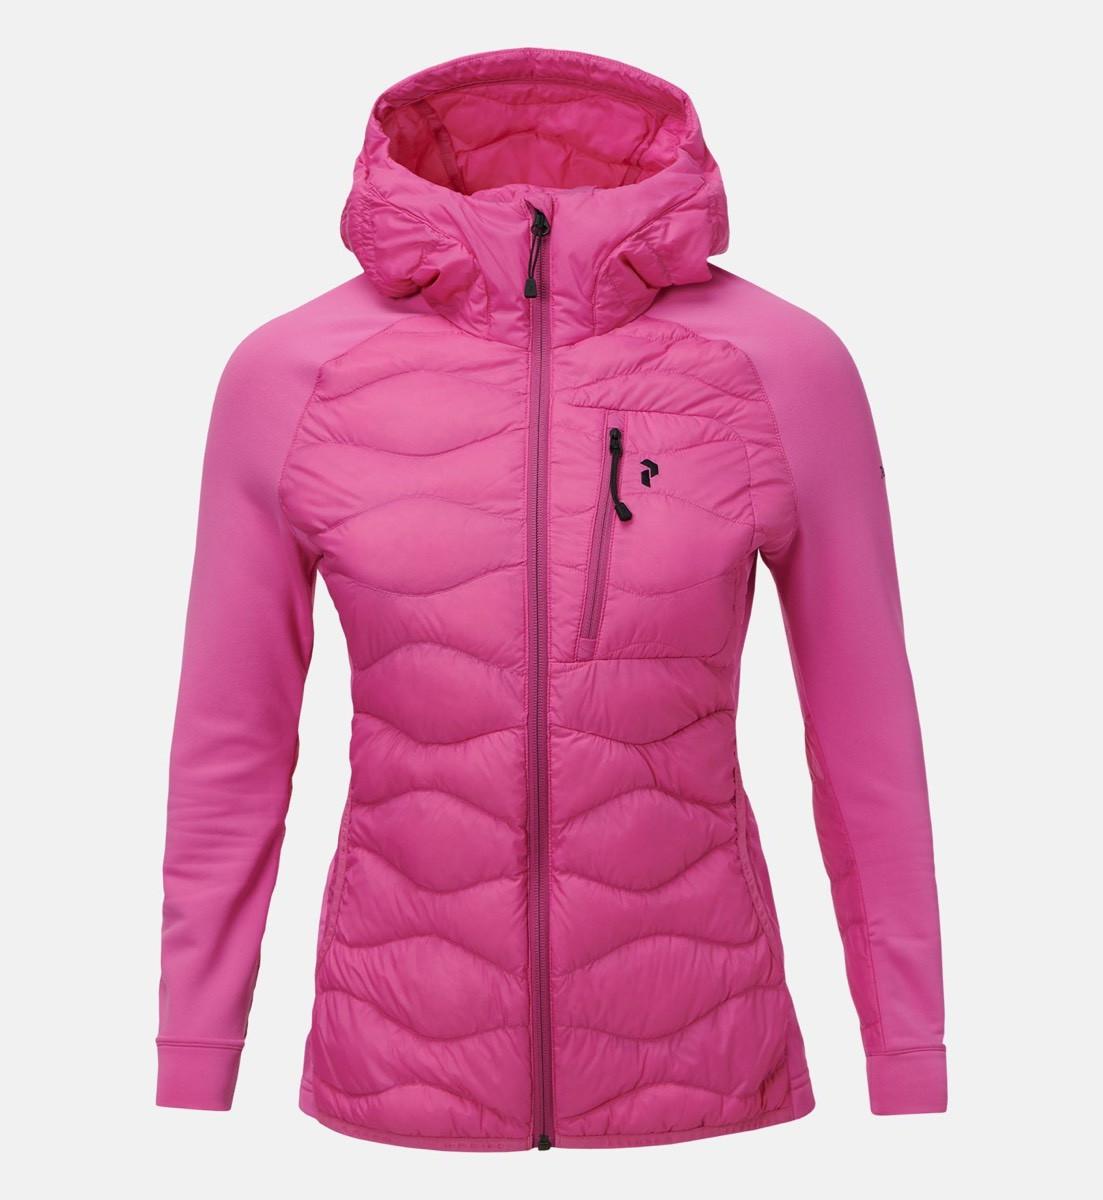 b8e40545ddc ... Peak Performance Women's Helium Hybrid Hood Jacket Vibrant Pink ...